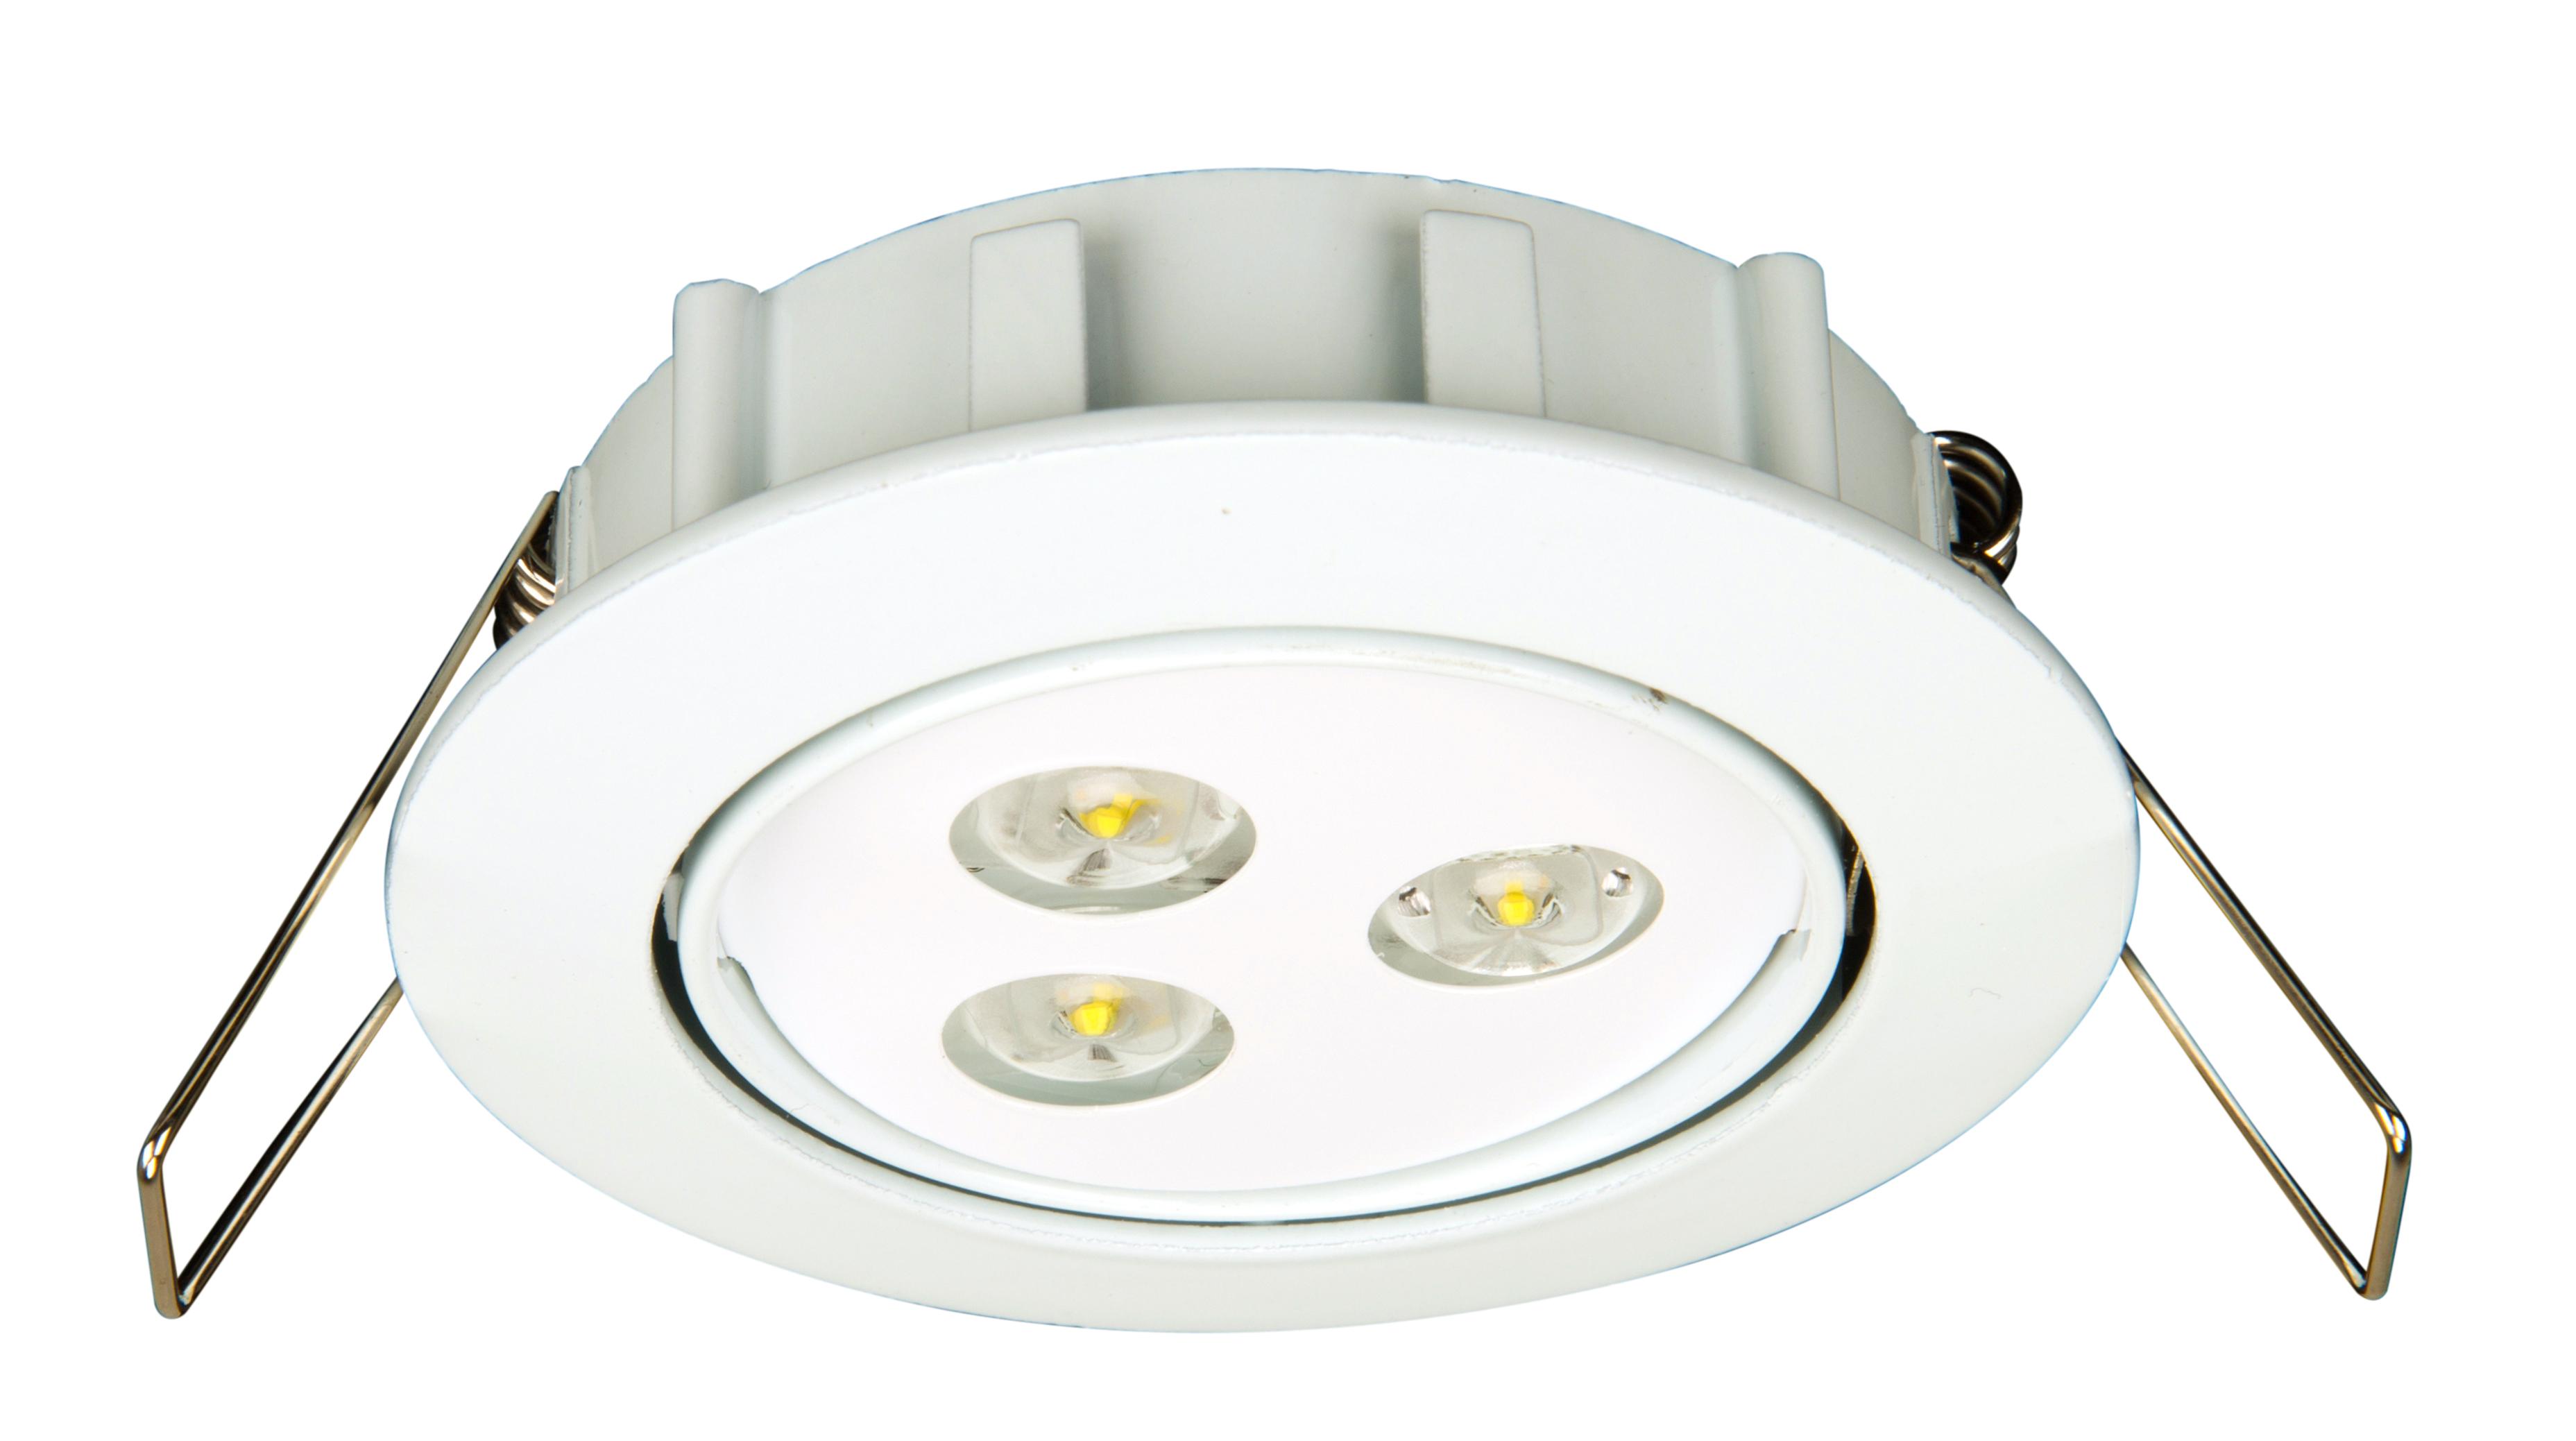 1 Stk Notleuchte DHE Autotest 3x1W ERT-LED 3h 230VAC NLDHE023SC